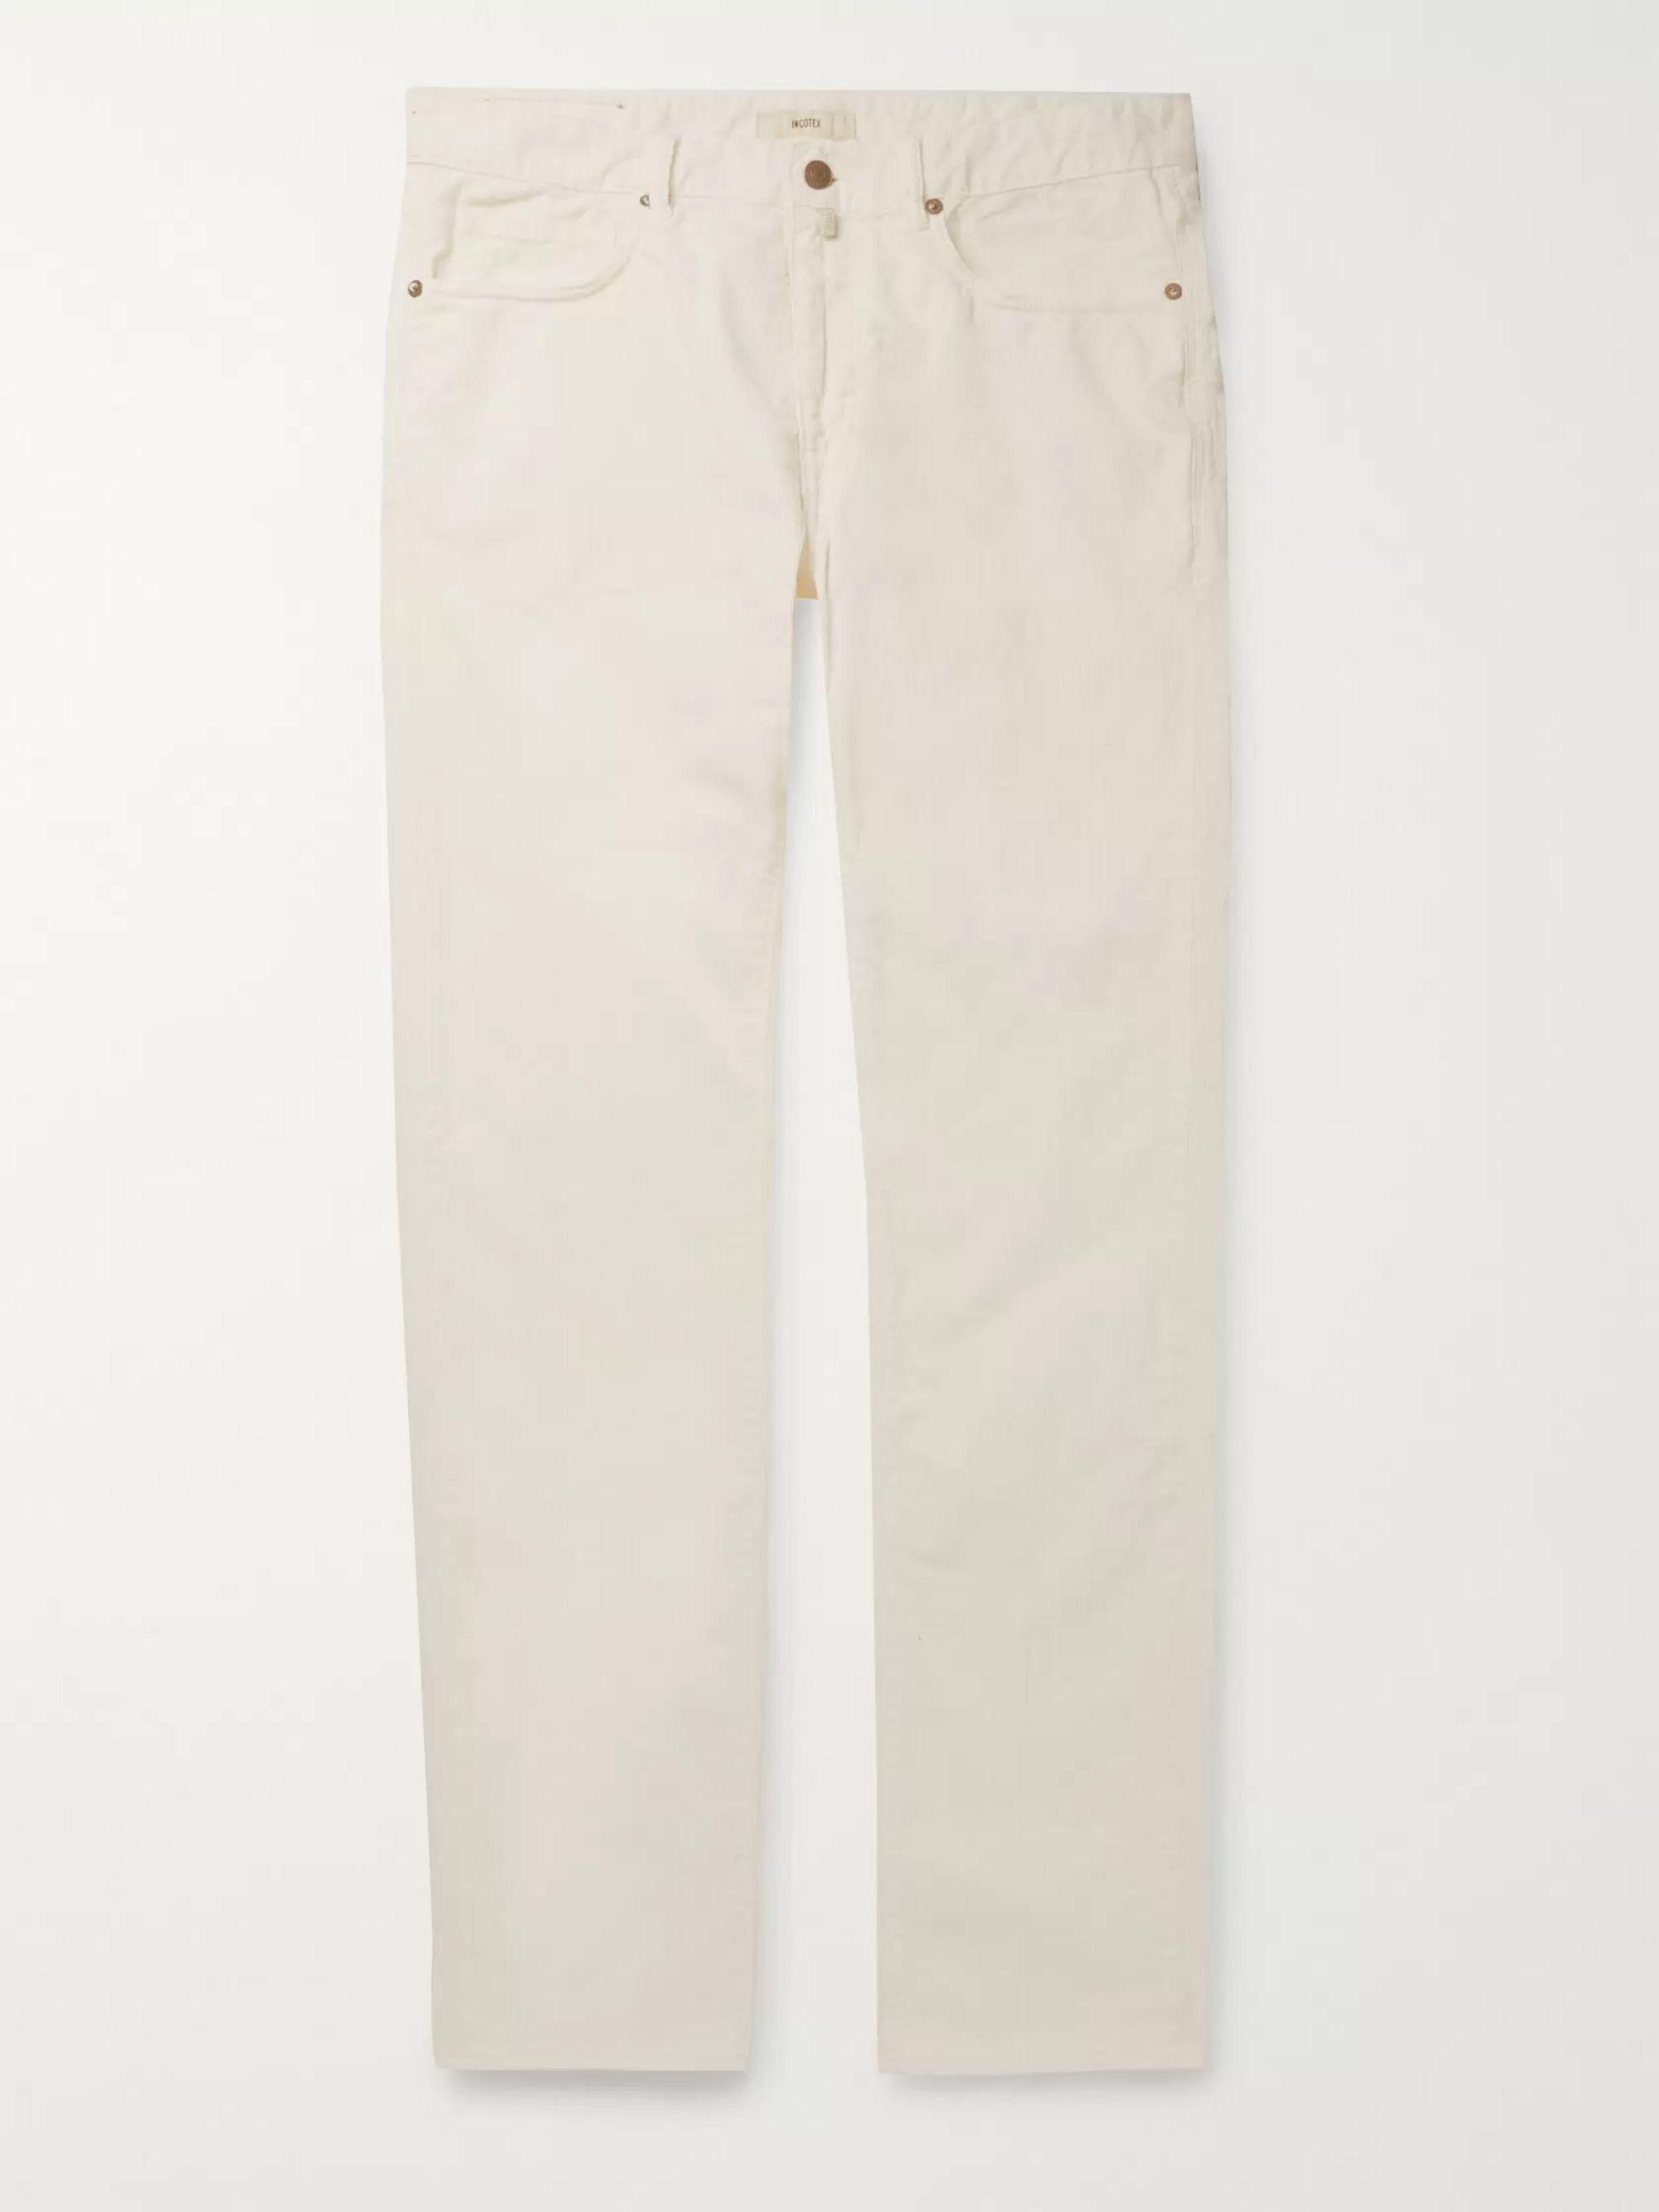 Slim Fit Cotton Blend Corduroy Trousers by Incotex